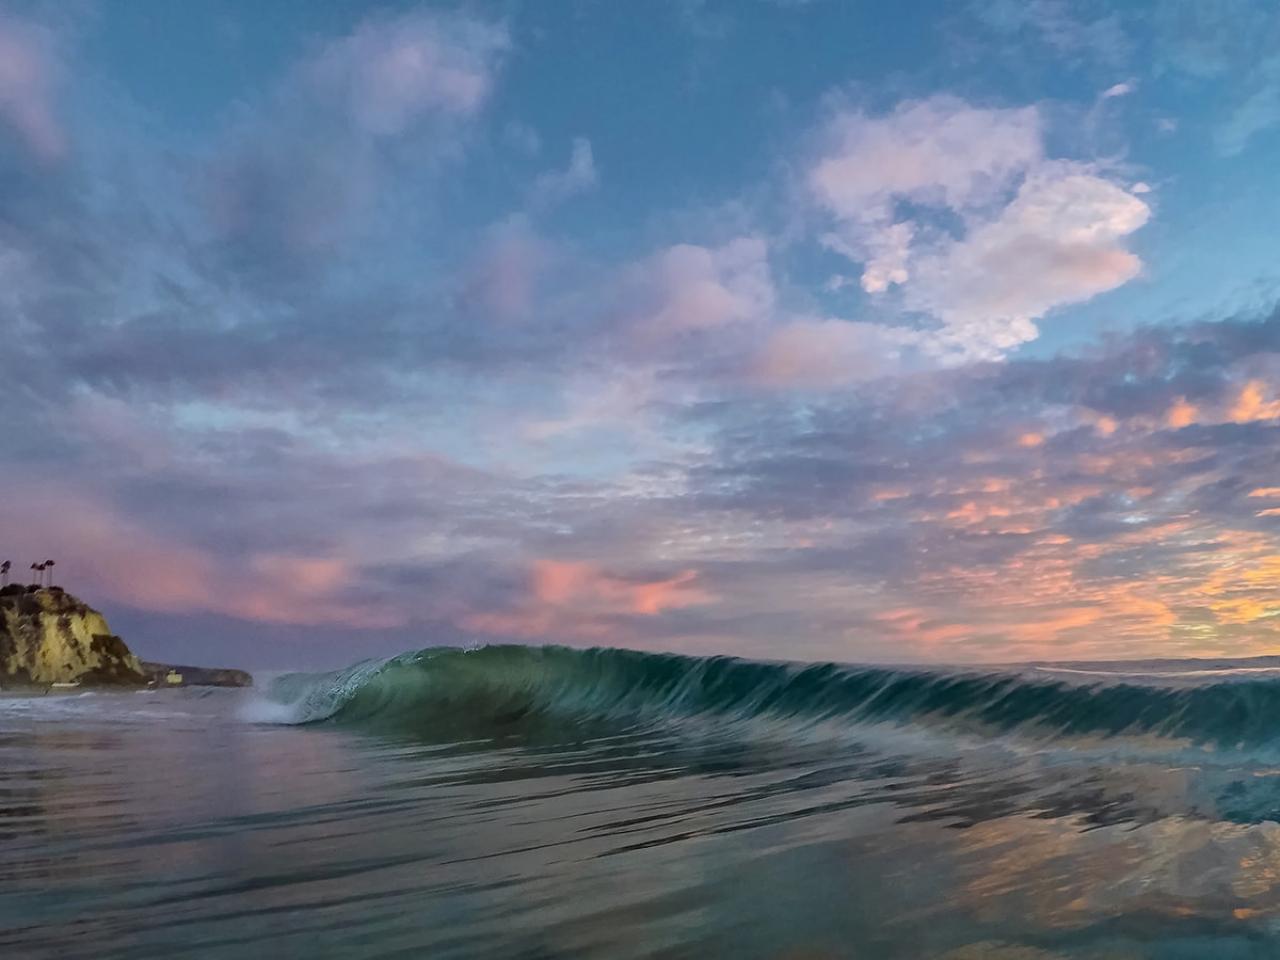 Las olas al atardecer - 1280x960